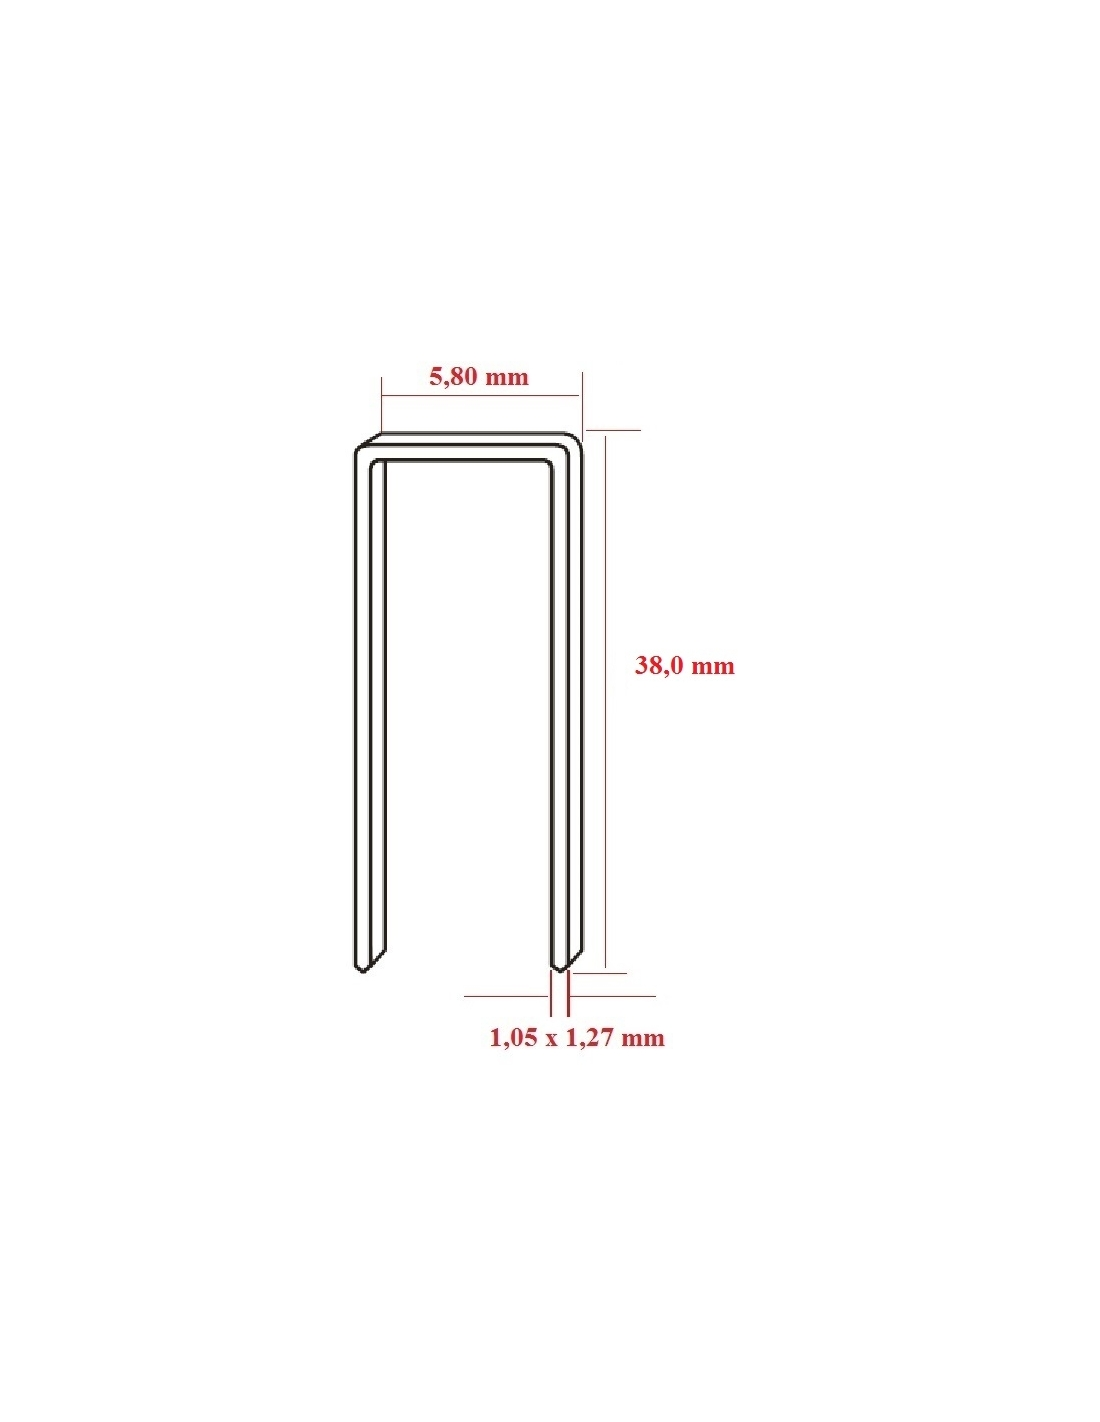 Capse tip U 90 cu lungimea de 38,0 mm - dimensiuni